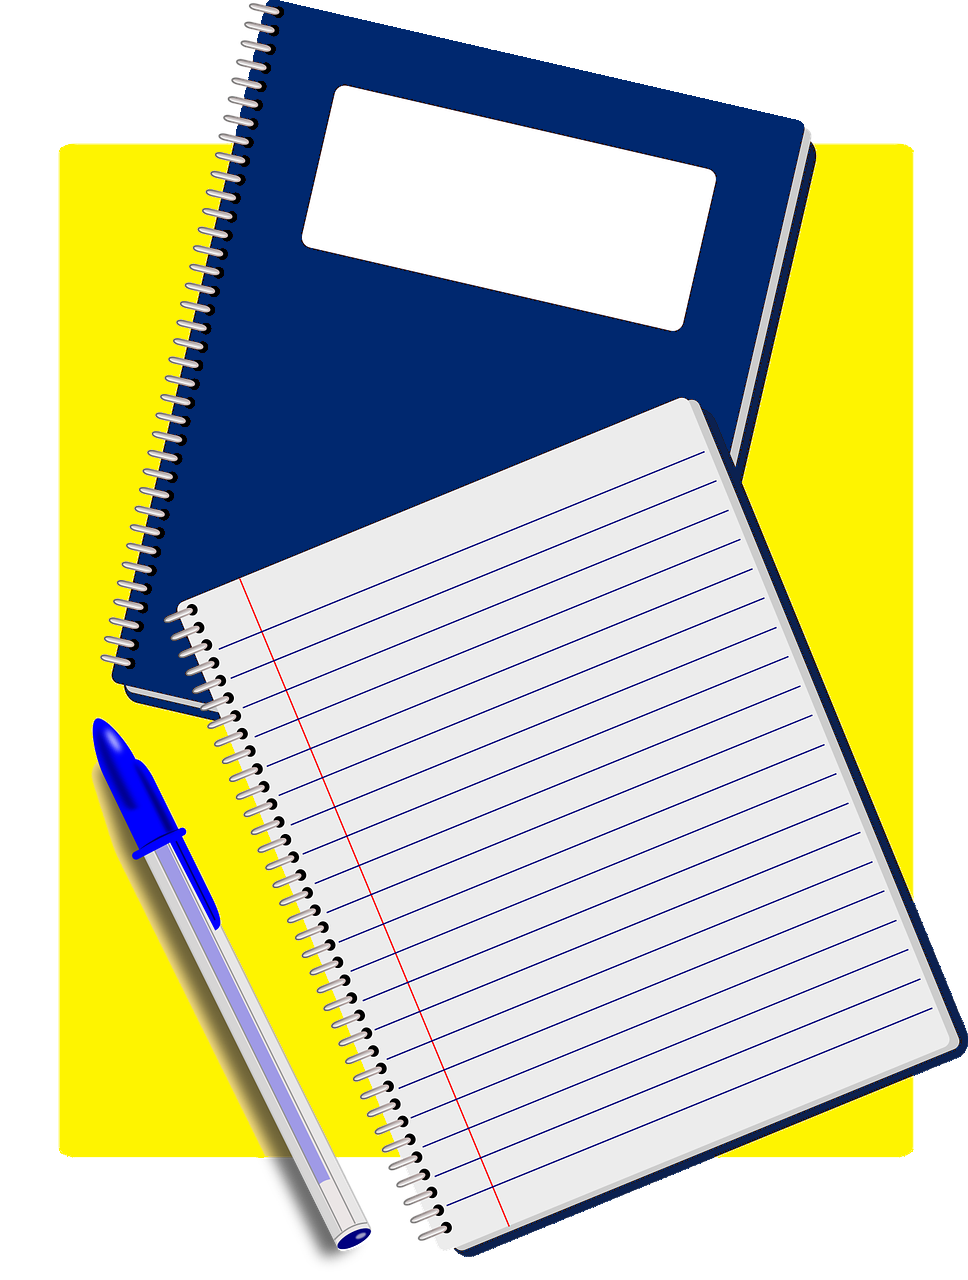 notebooks-1902570_1280